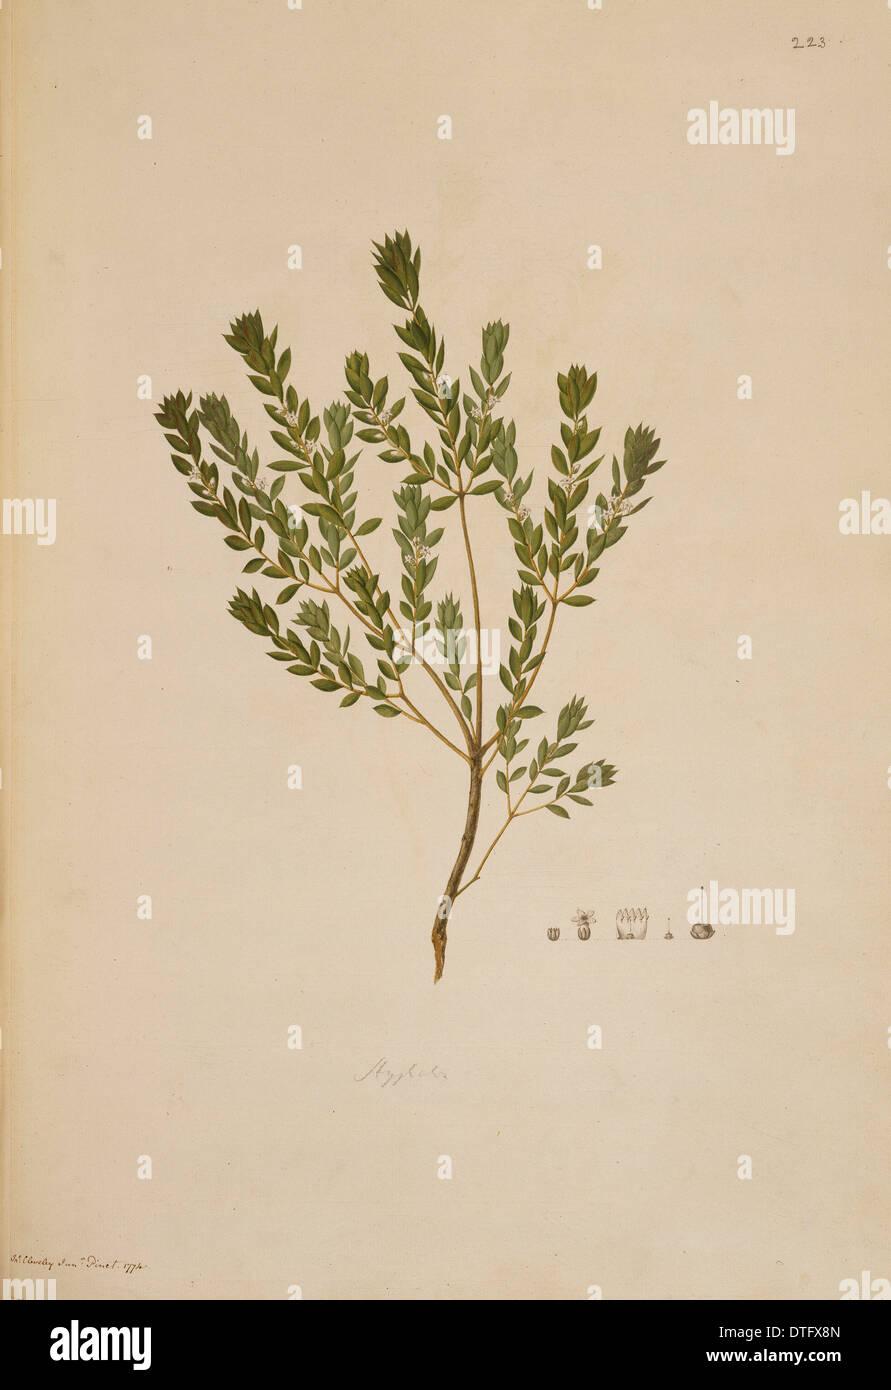 Leucopogon ruscifolius, bearded heath - Stock Image